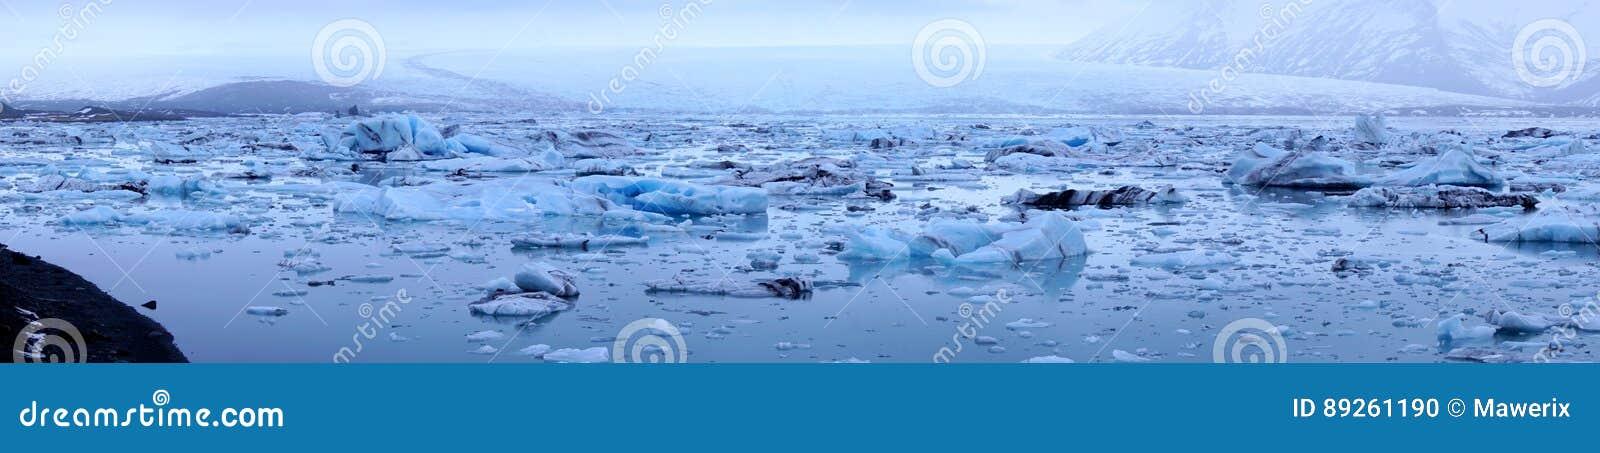 Ice glaciers